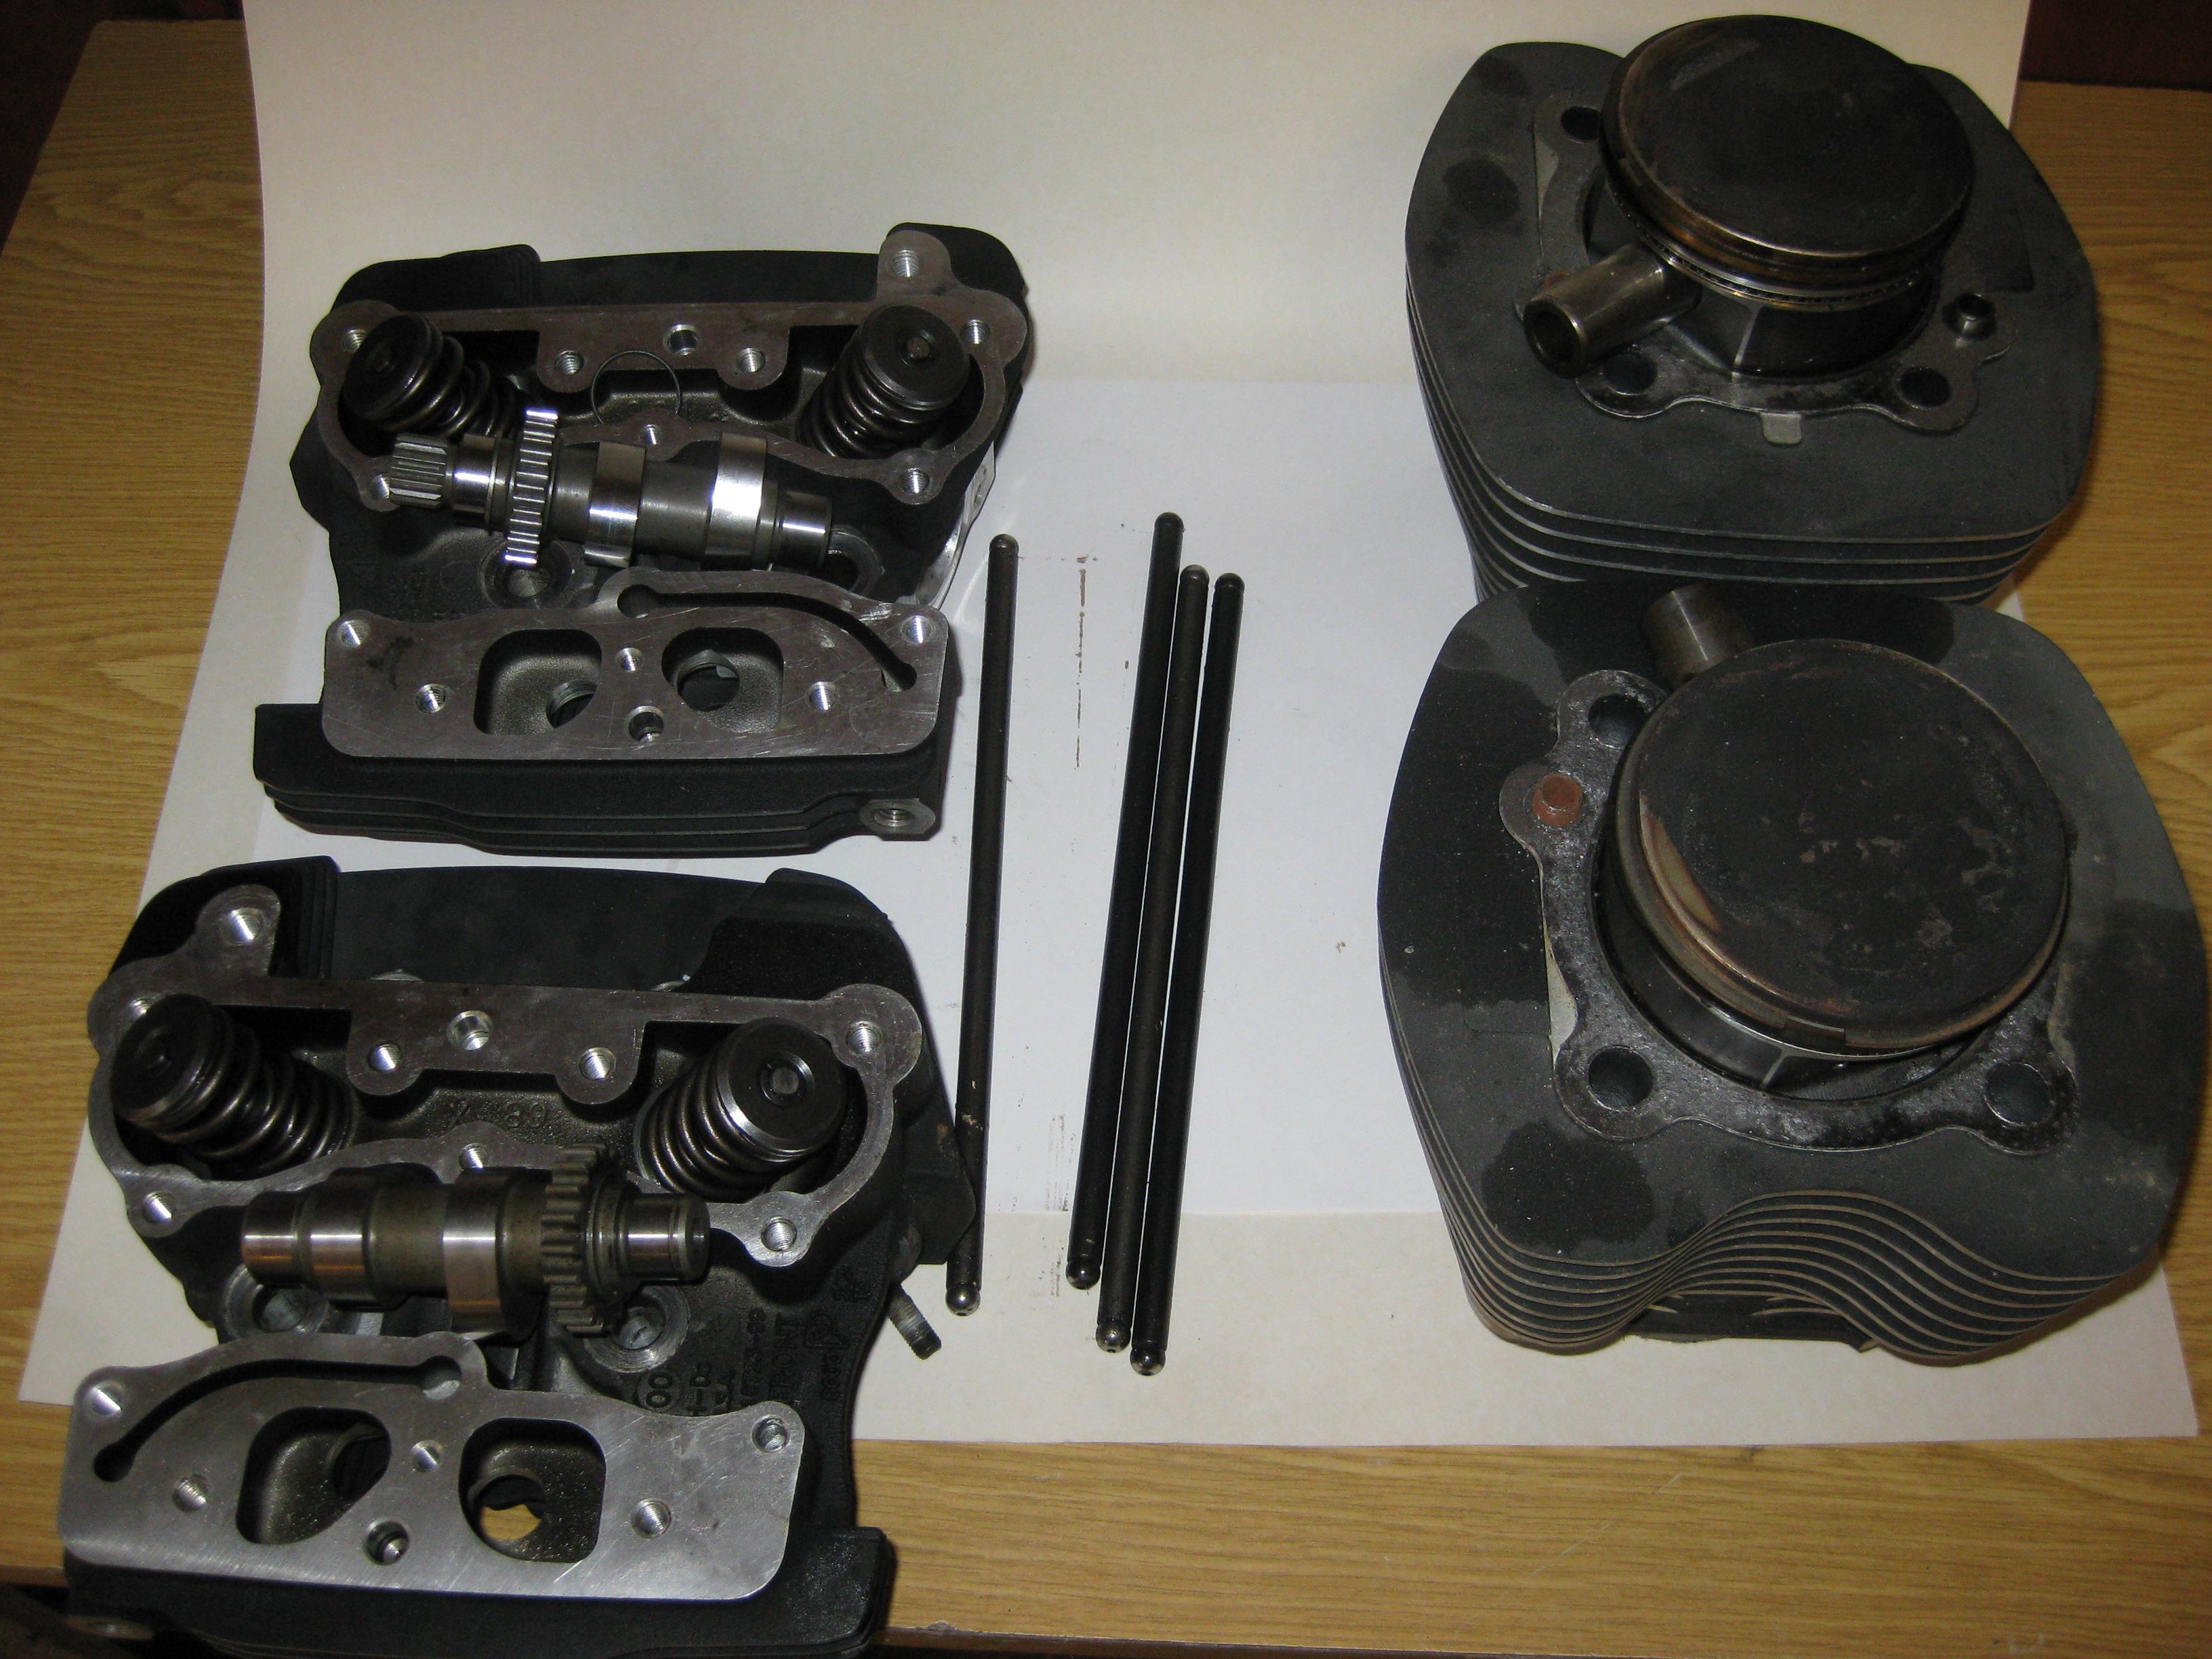 Tunings sæt Softail 1450ccm / 88 cui